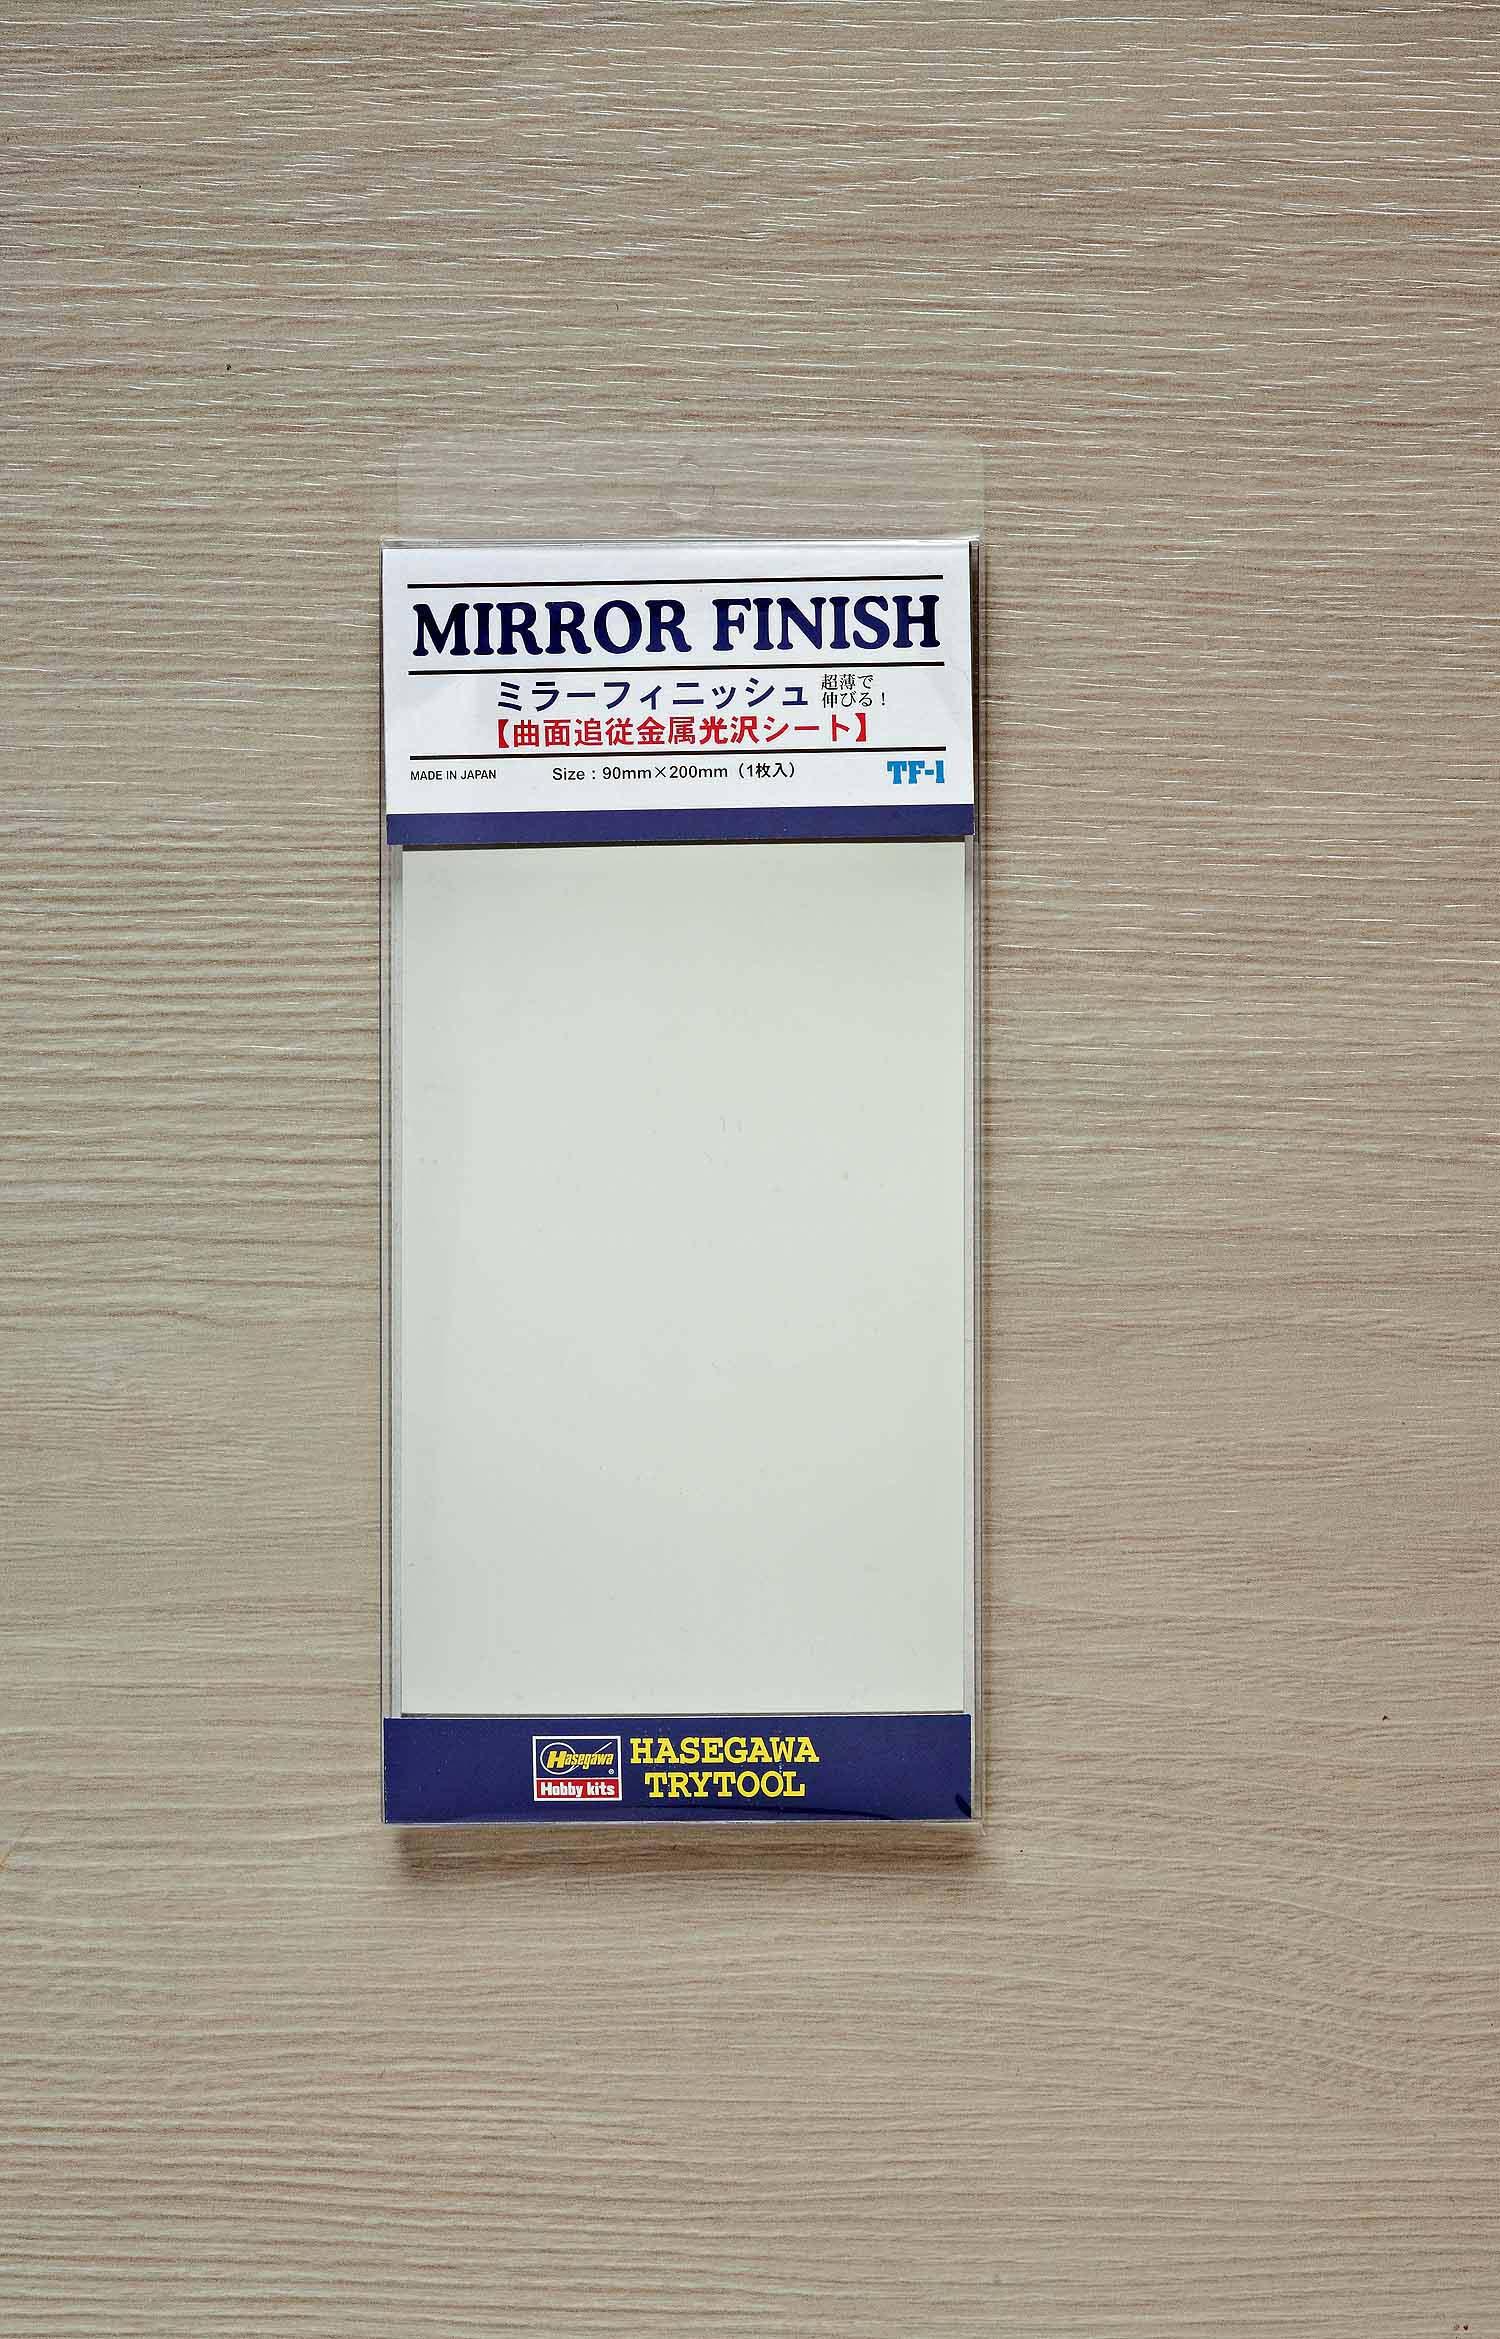 Hasegawa Mirror Finish